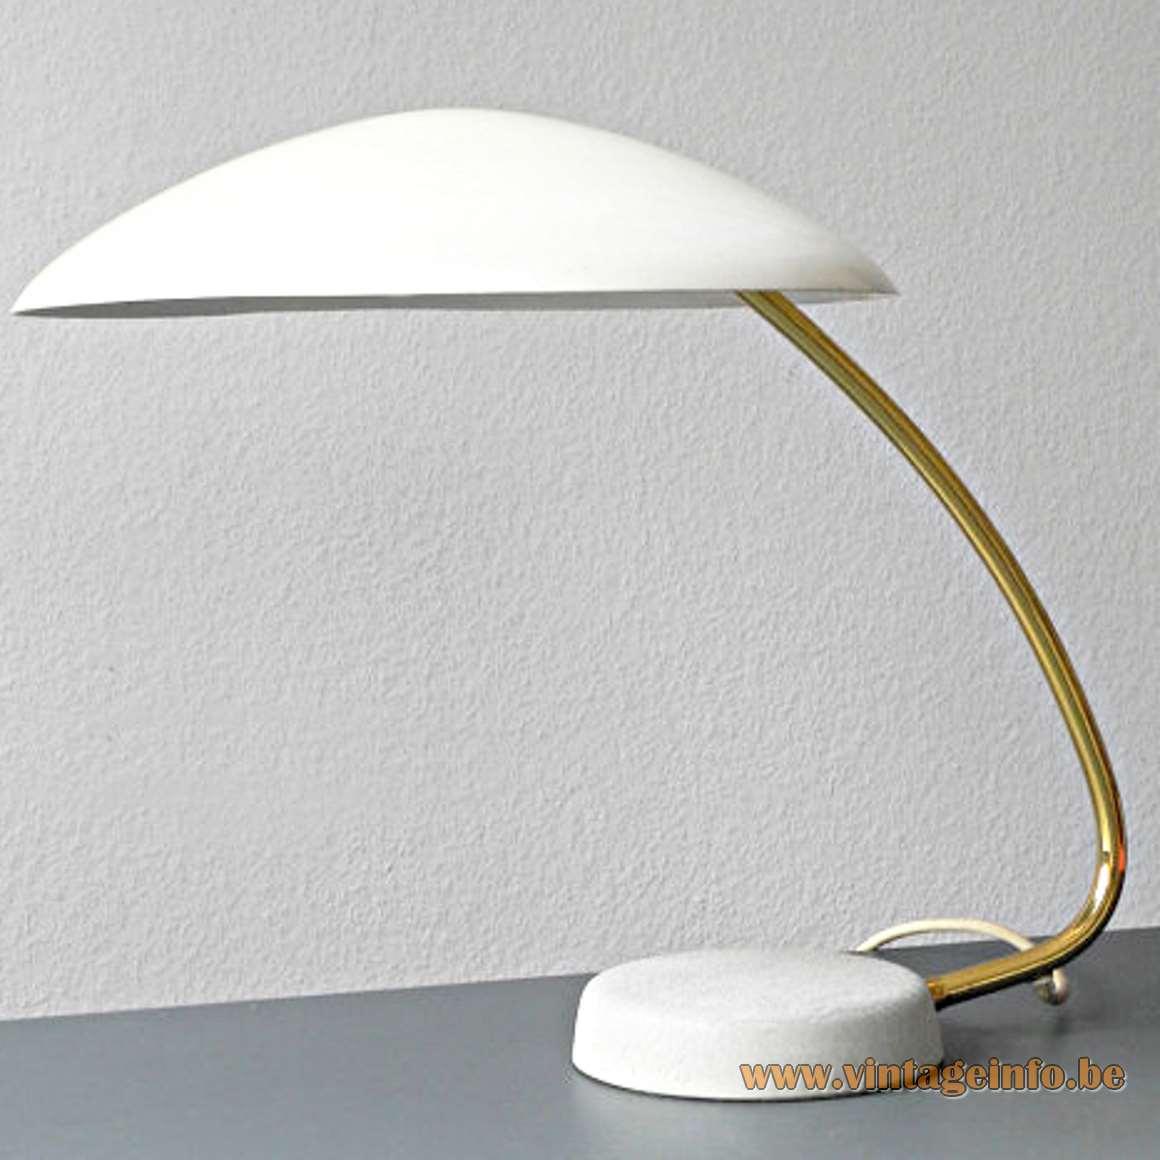 Gebrüder Cosack white UFO desk lamp Gecos Germany 1950s 1960s cast iron wrinkle paint brass aluminium